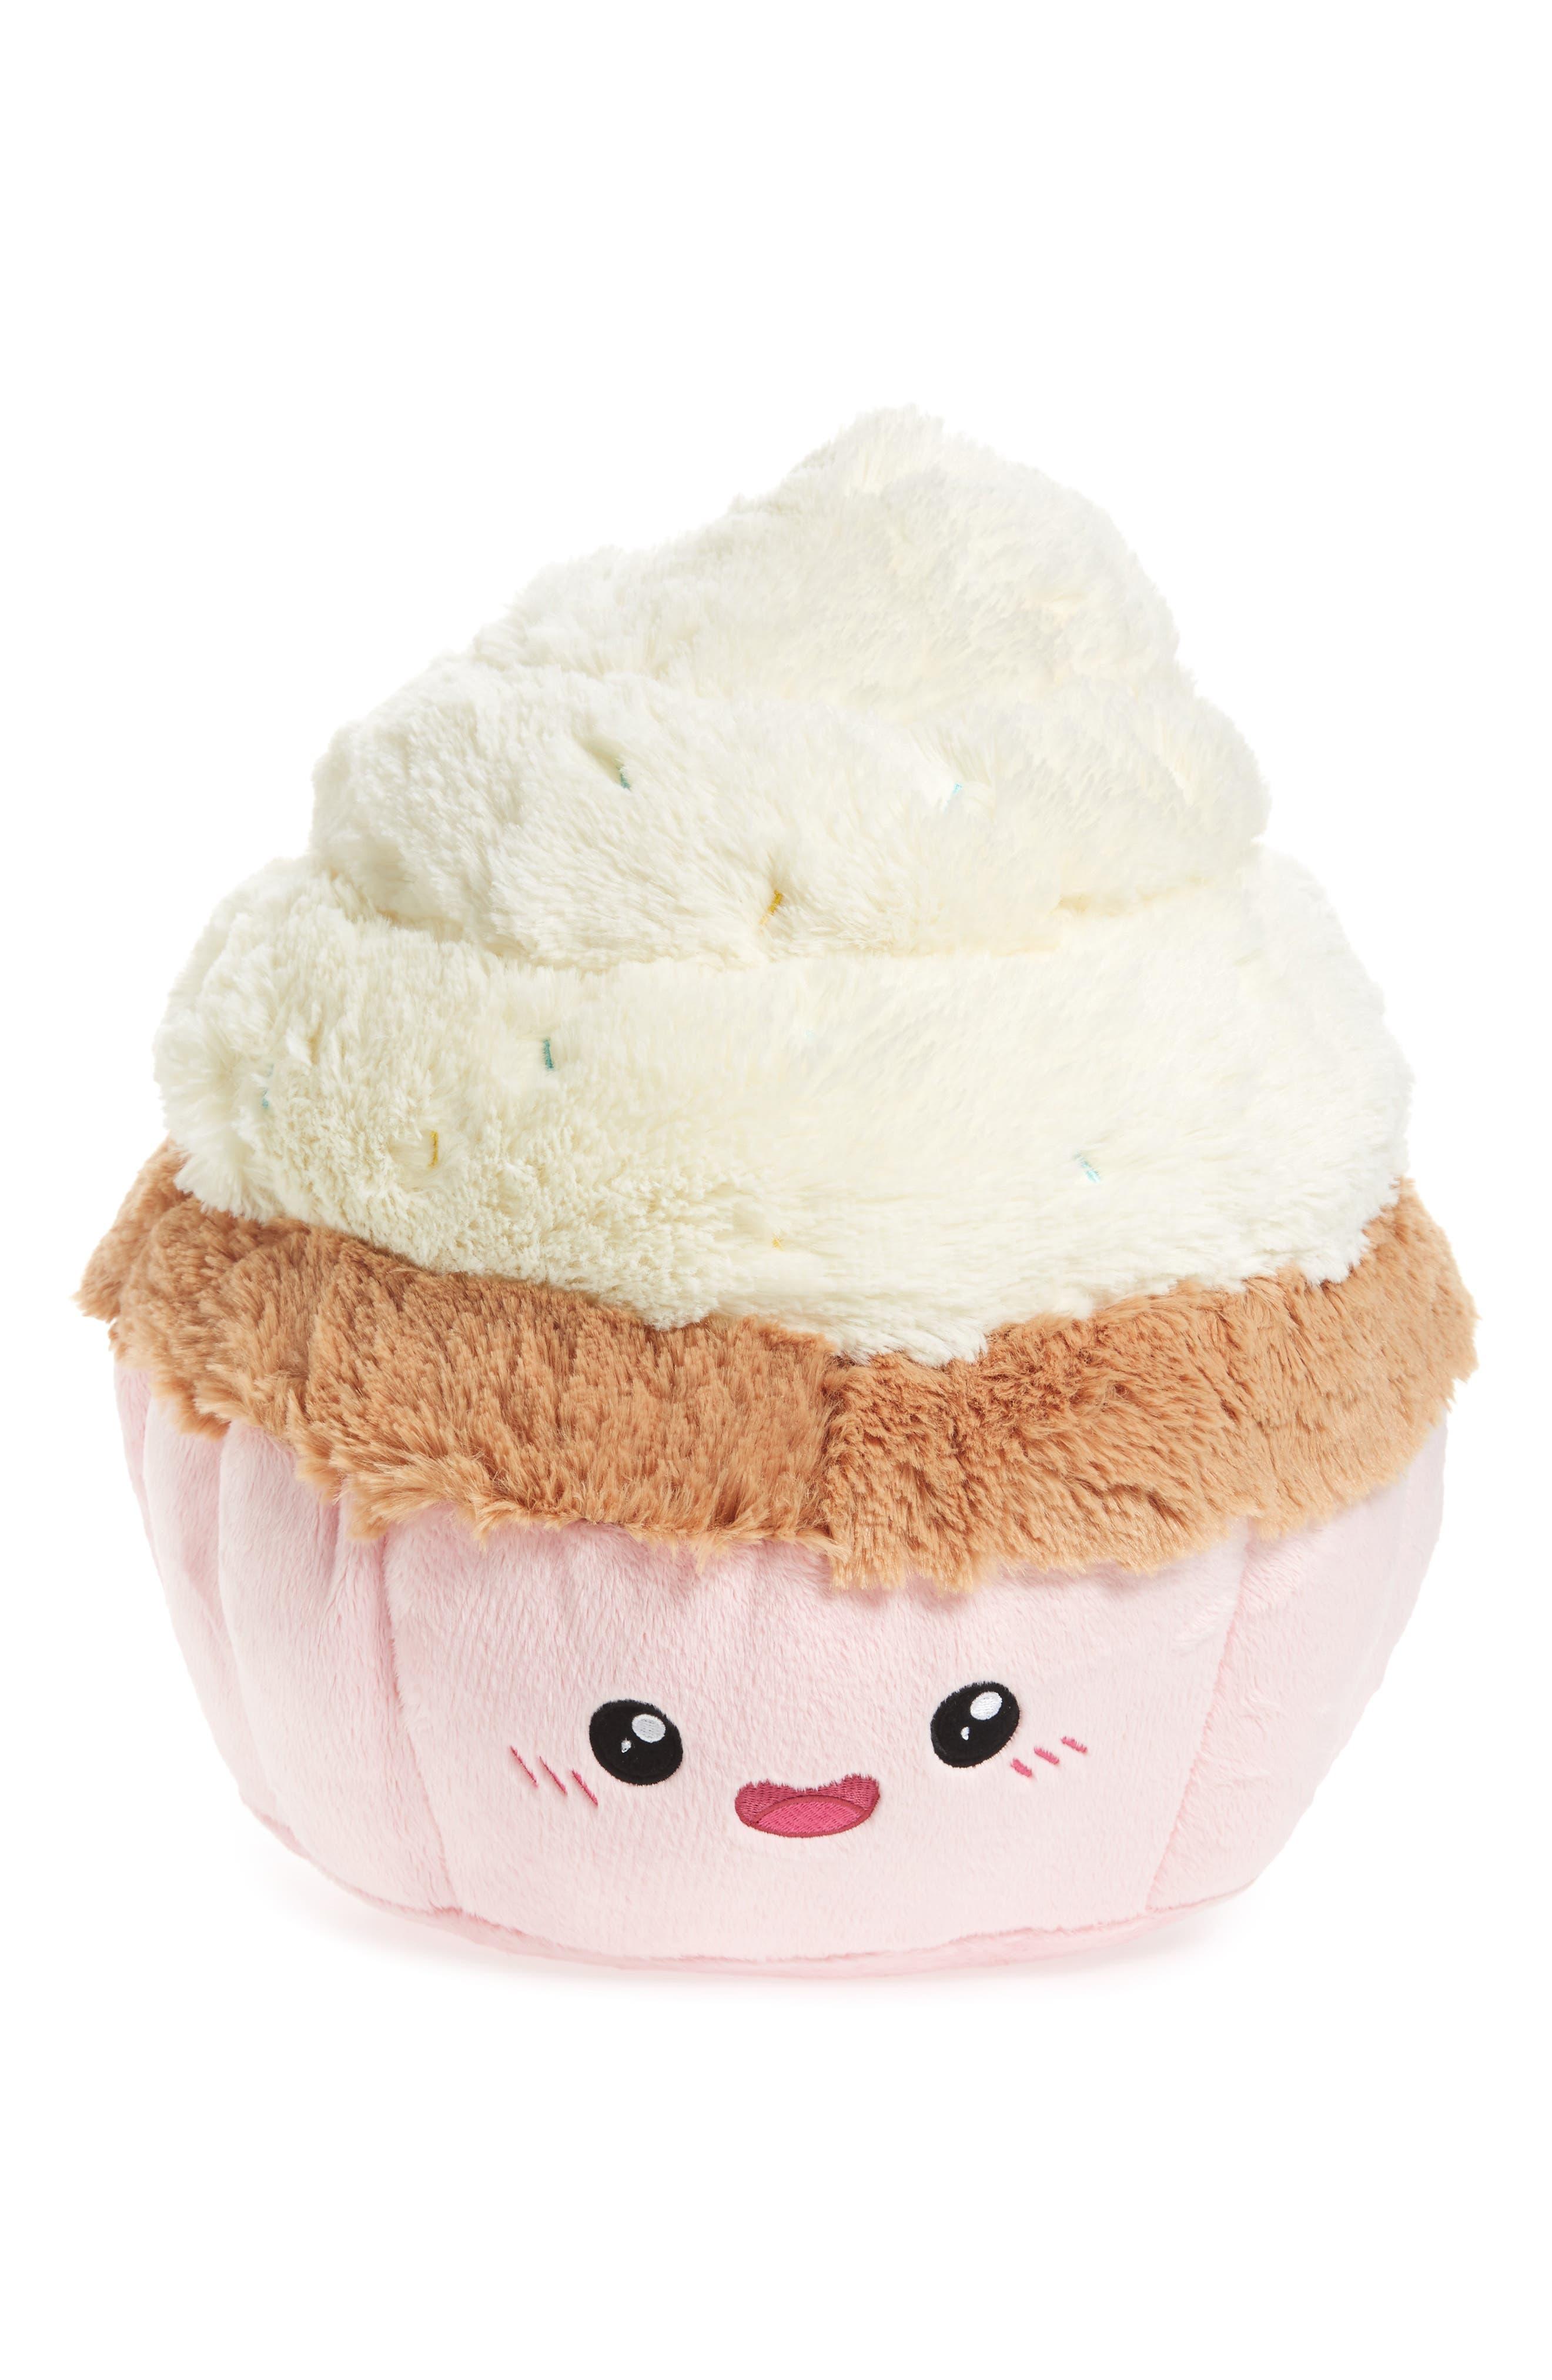 Vanilla Cupcake Stuffed Toy,                             Main thumbnail 1, color,                             100